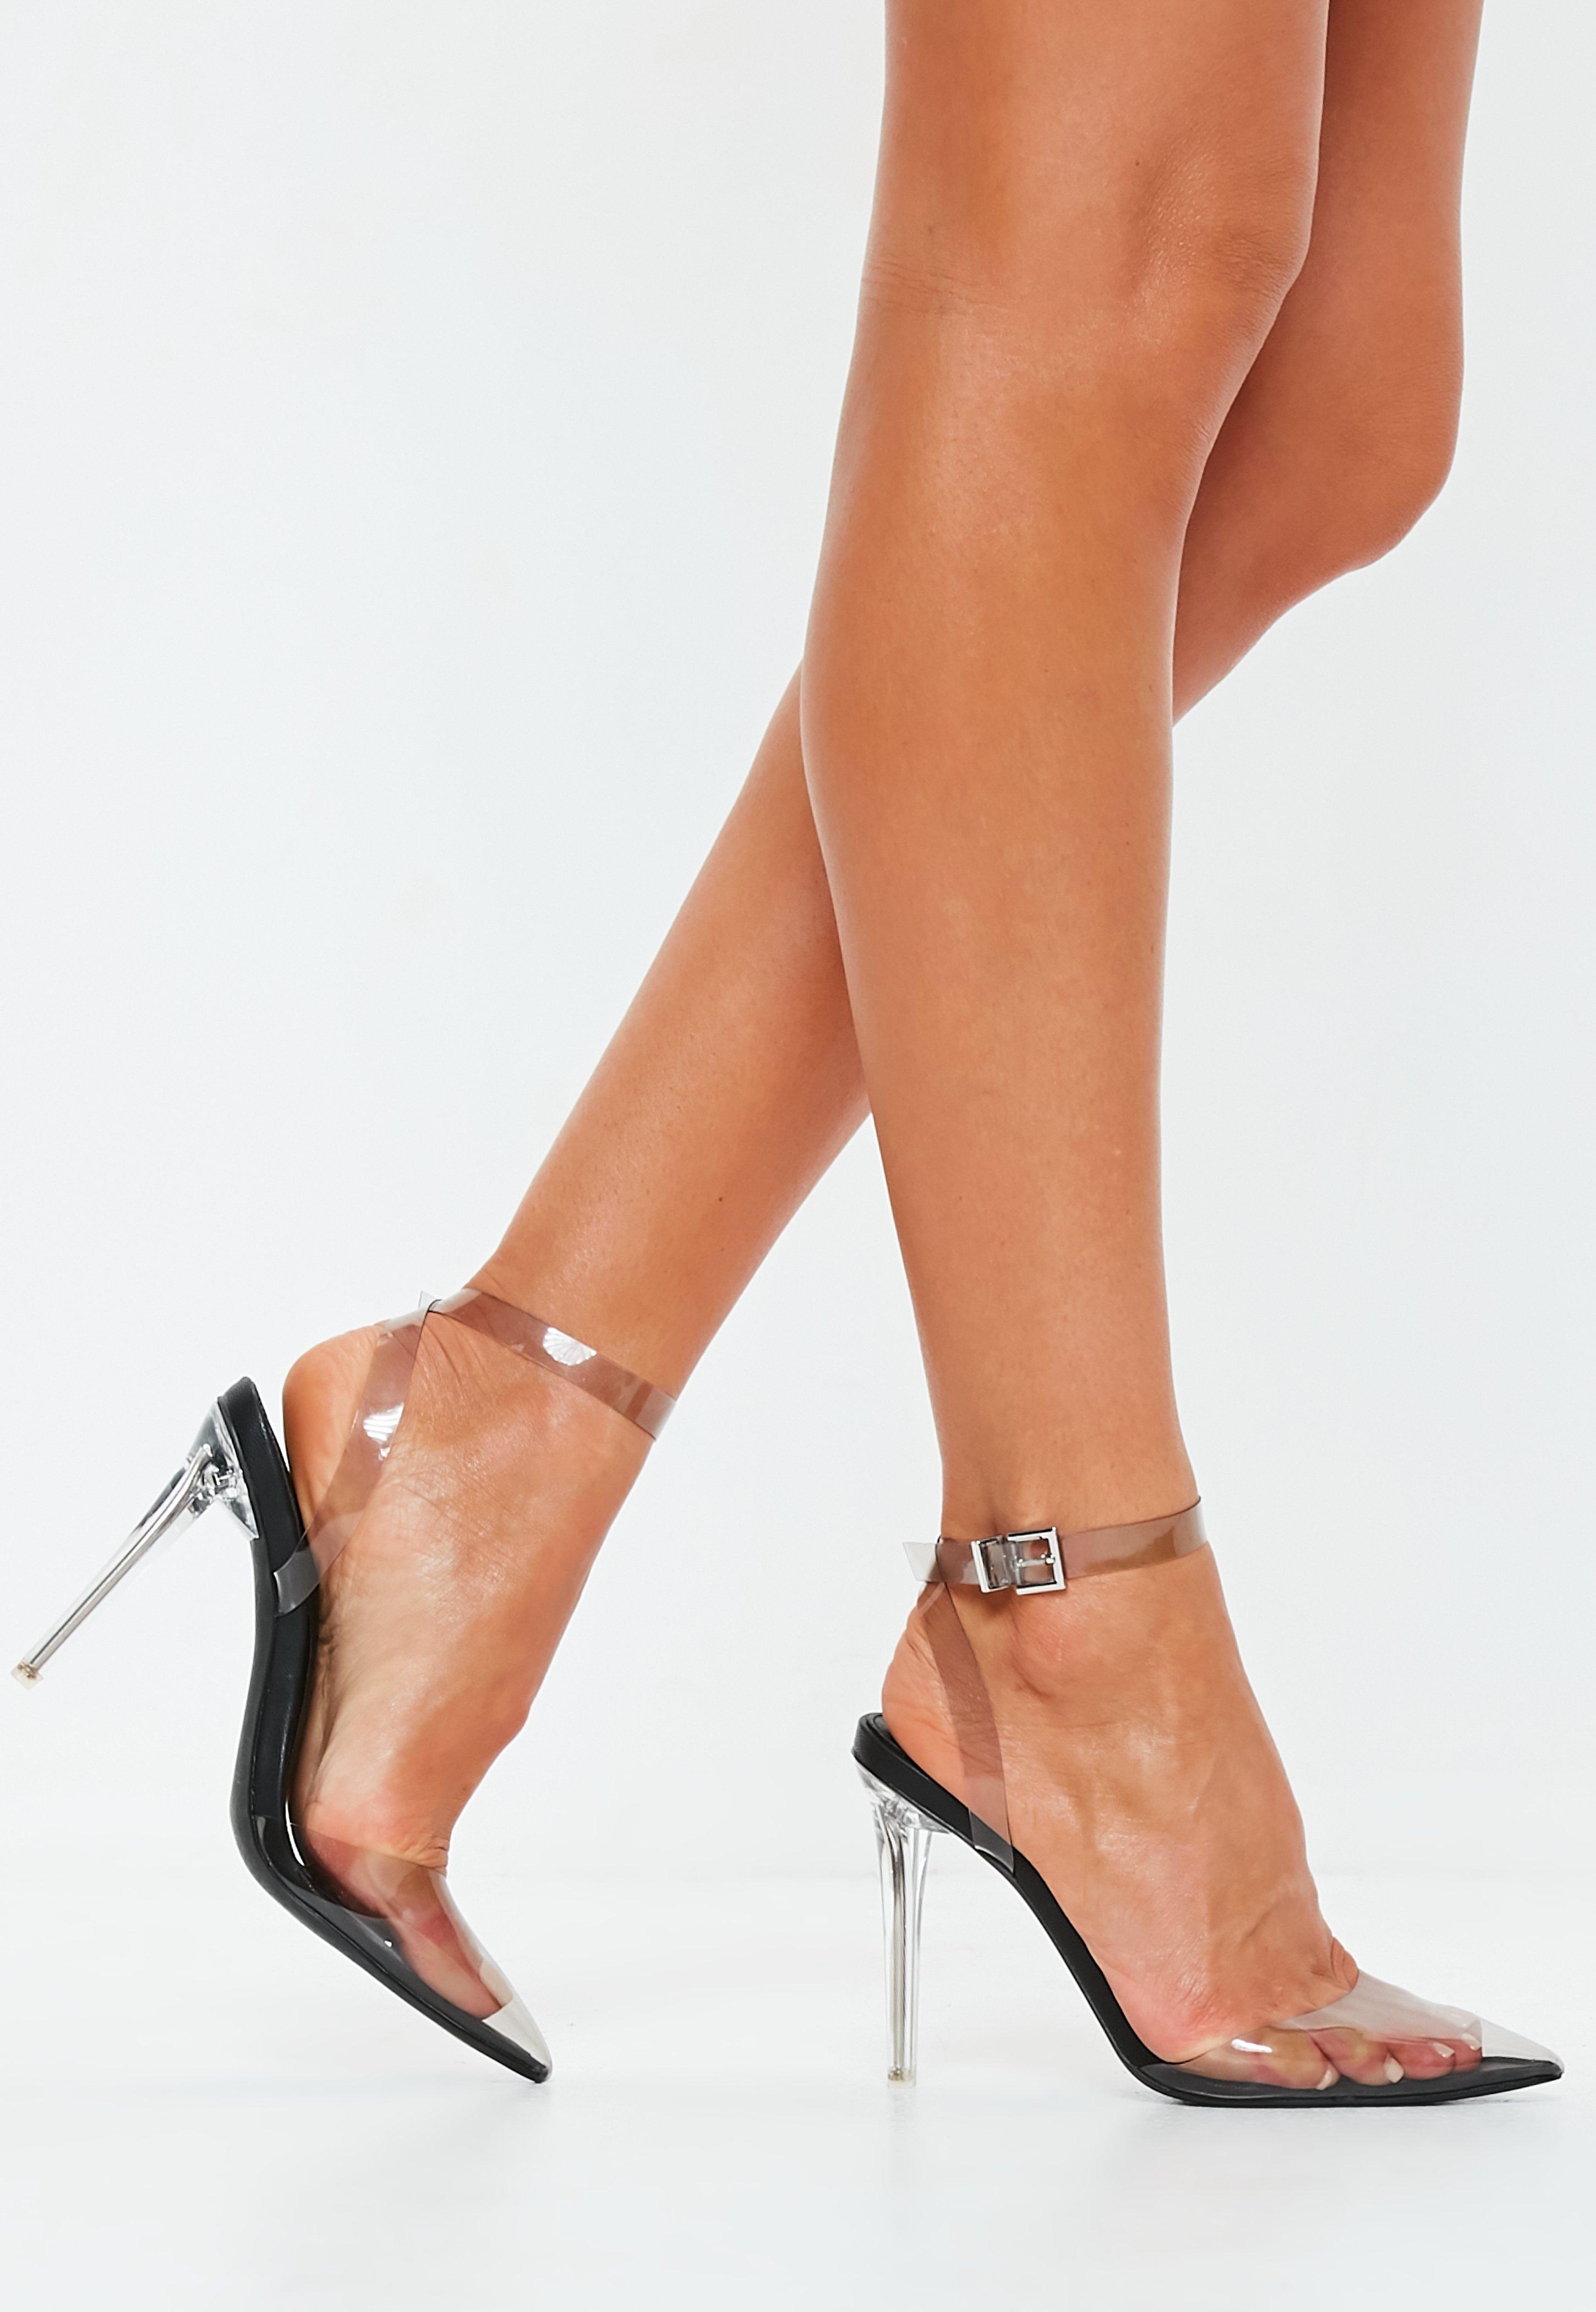 0f4b026928c Black Clear Pump Shoe Heels